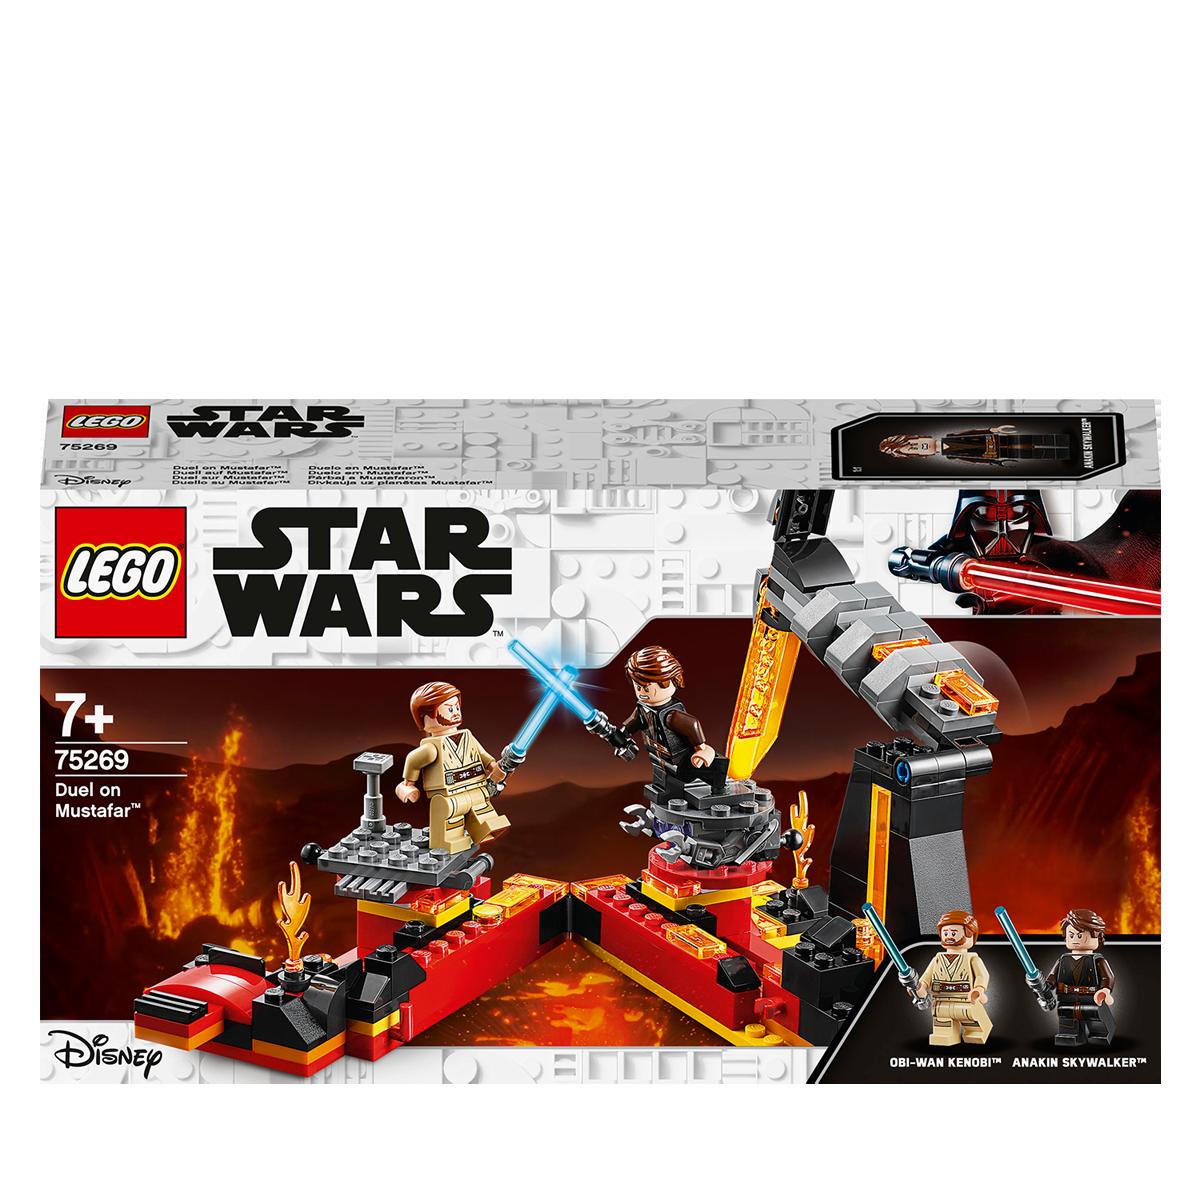 Star Wars lego mini figure accessory 5x mixed lightsabers